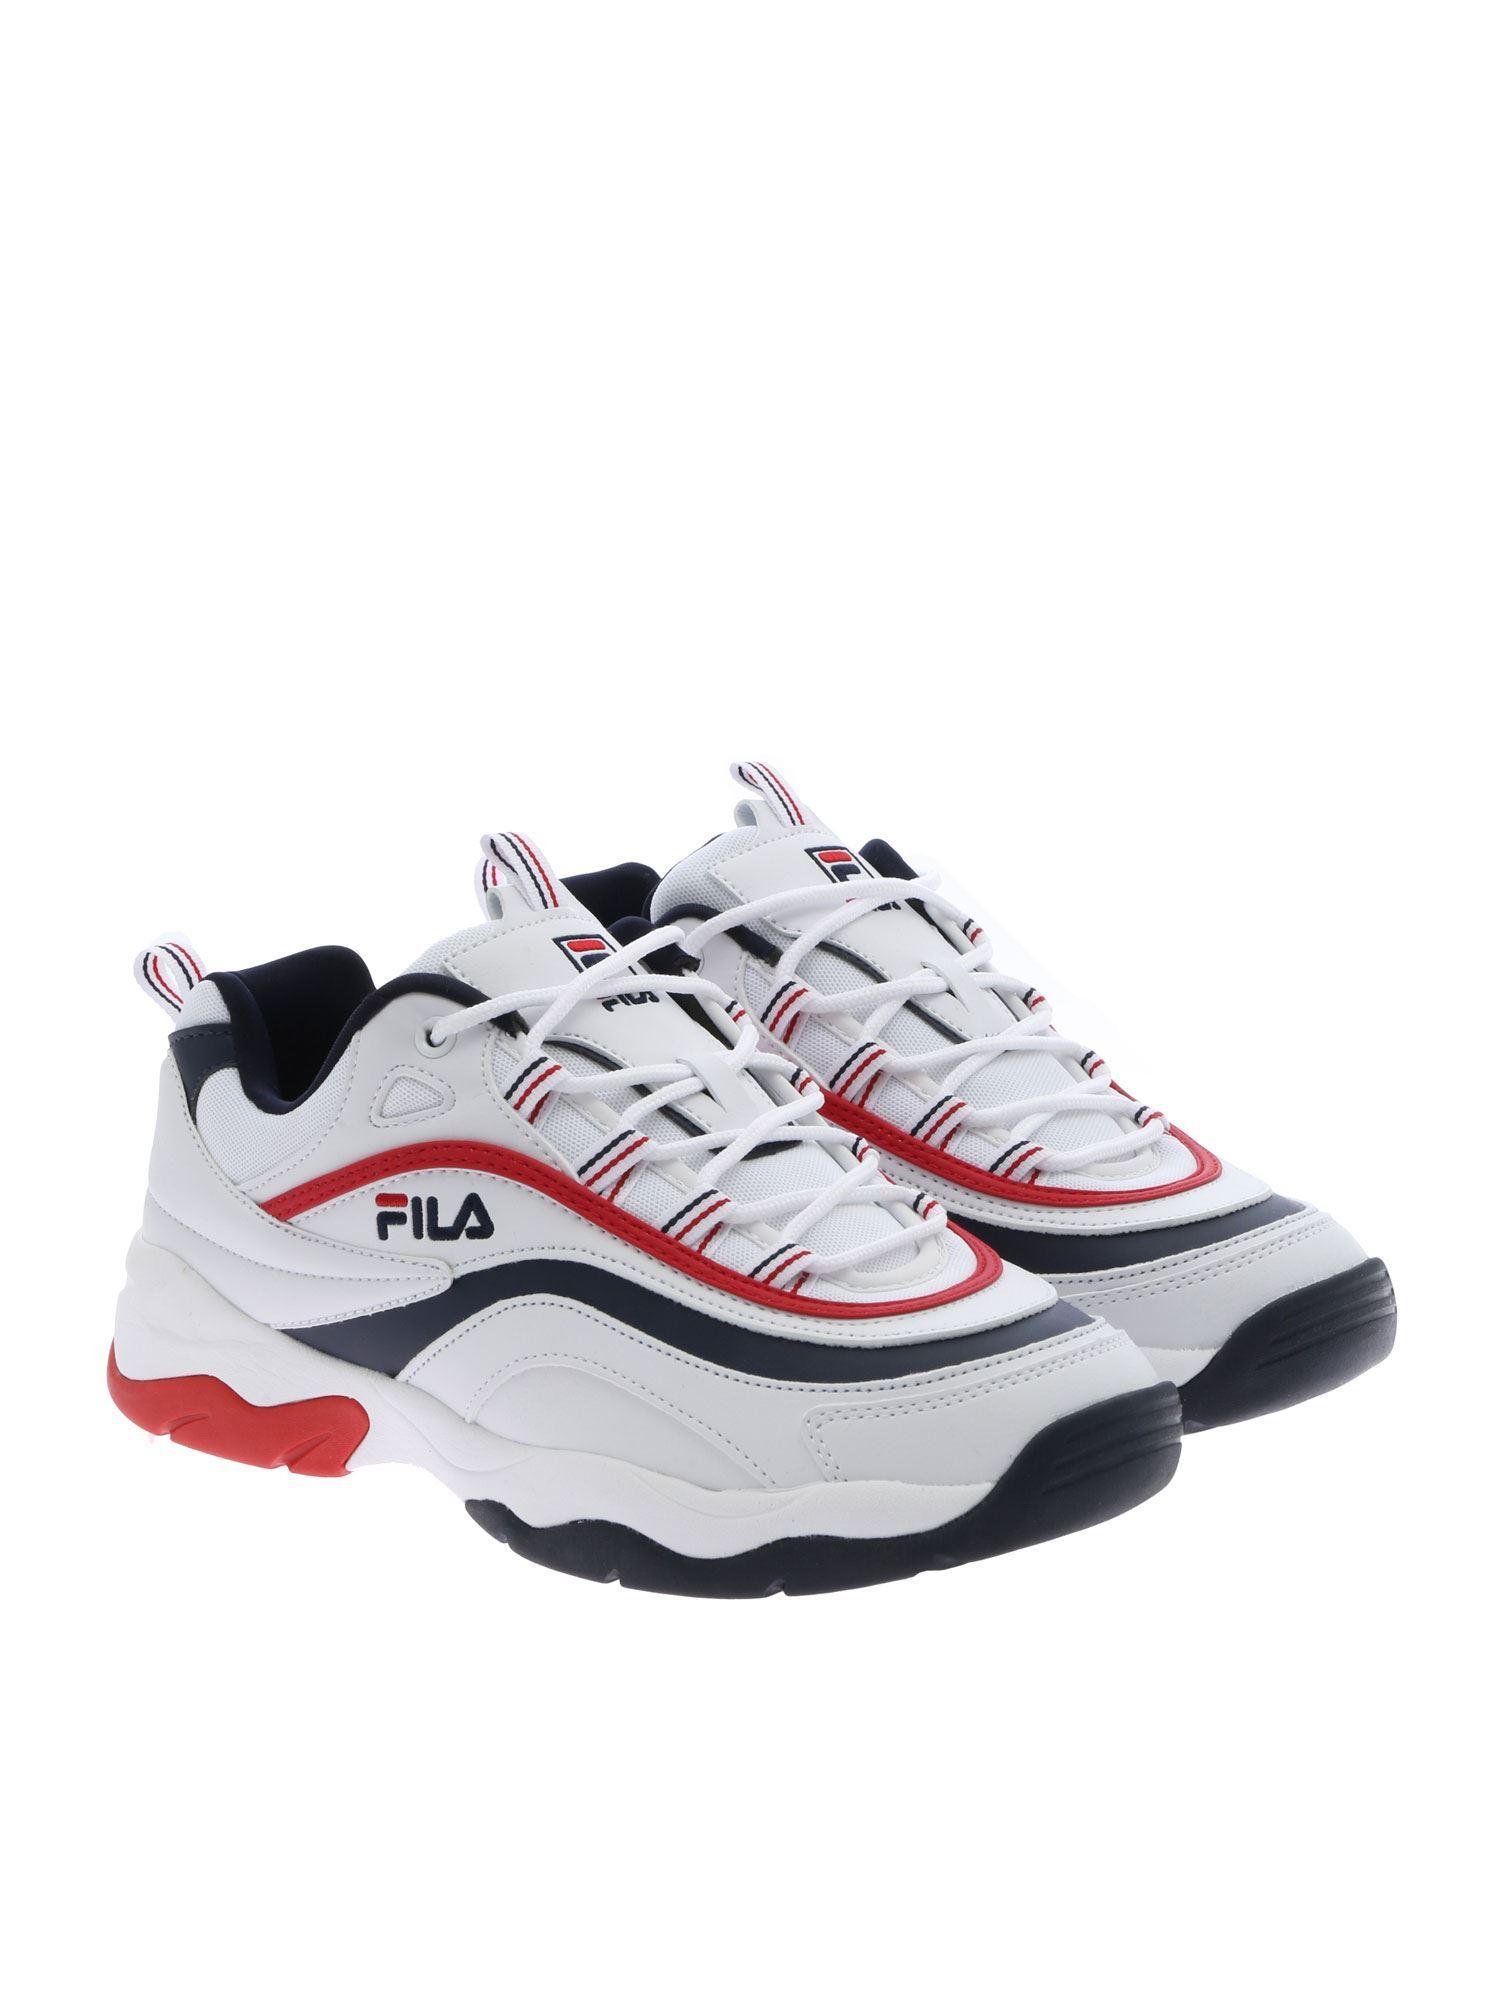 4d8064e8bddf Lyst - Fila  ray F  Sneakers in White for Men - Save 3%